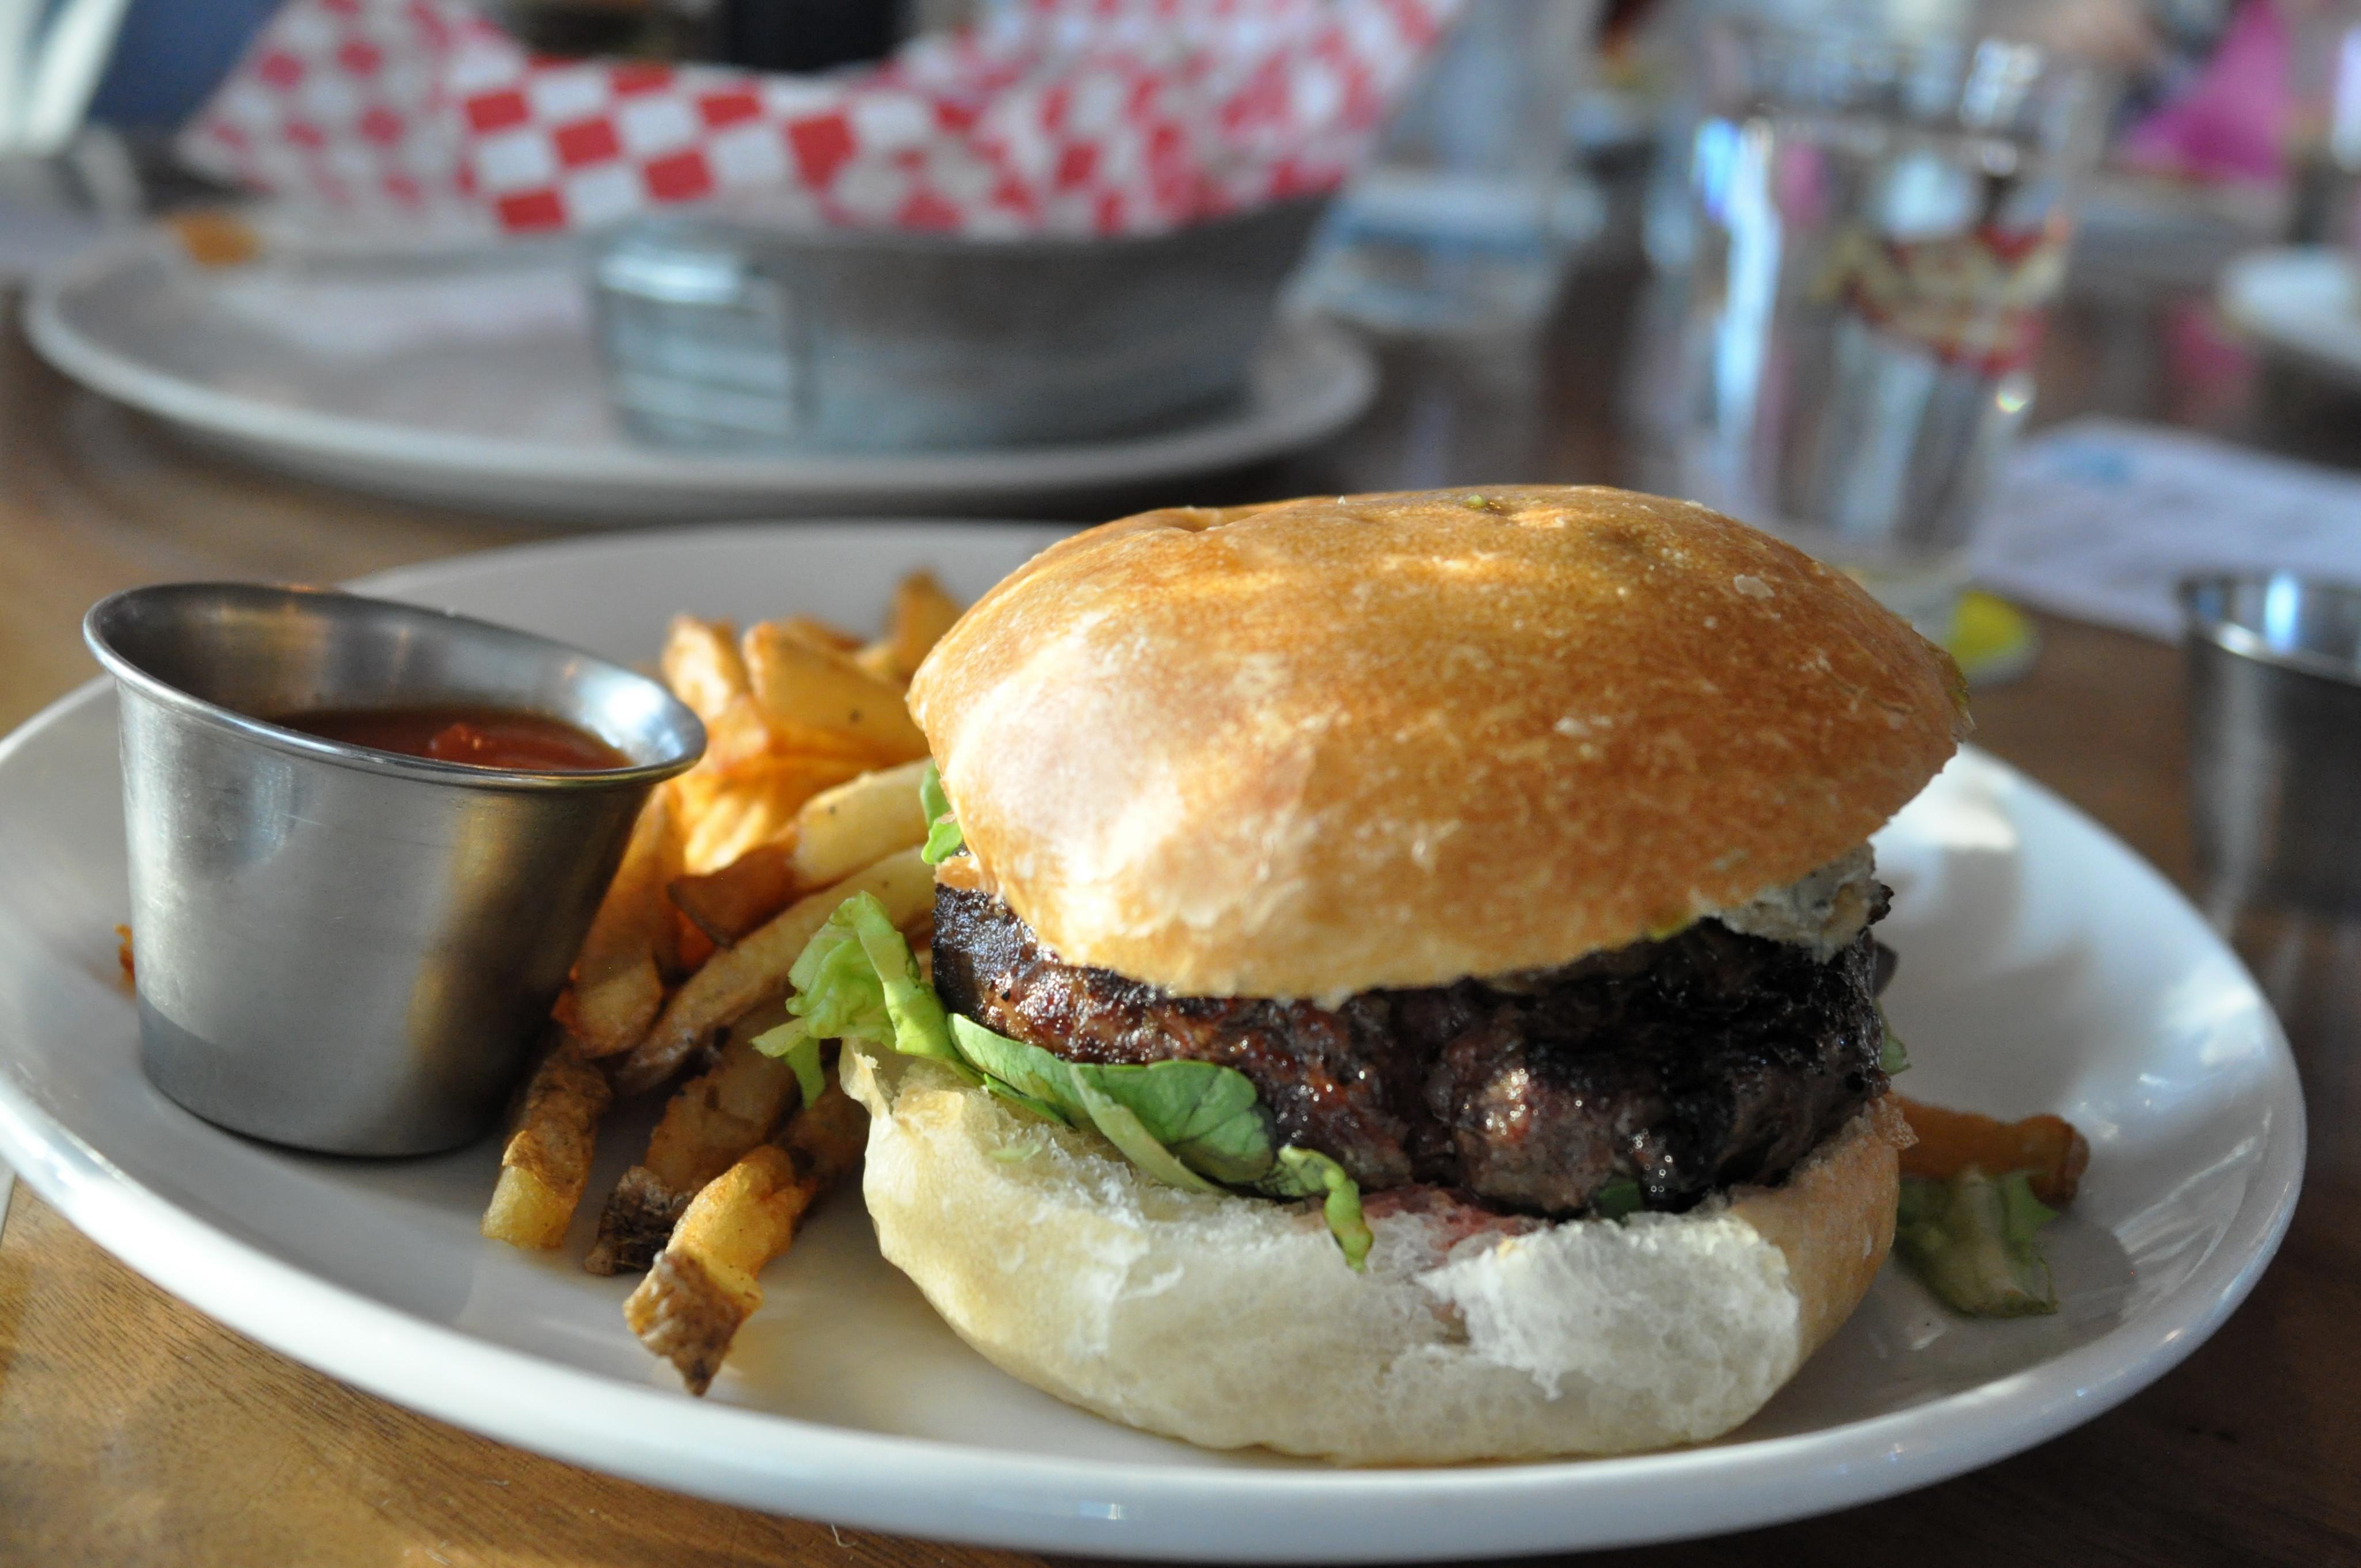 bleu cheese burger